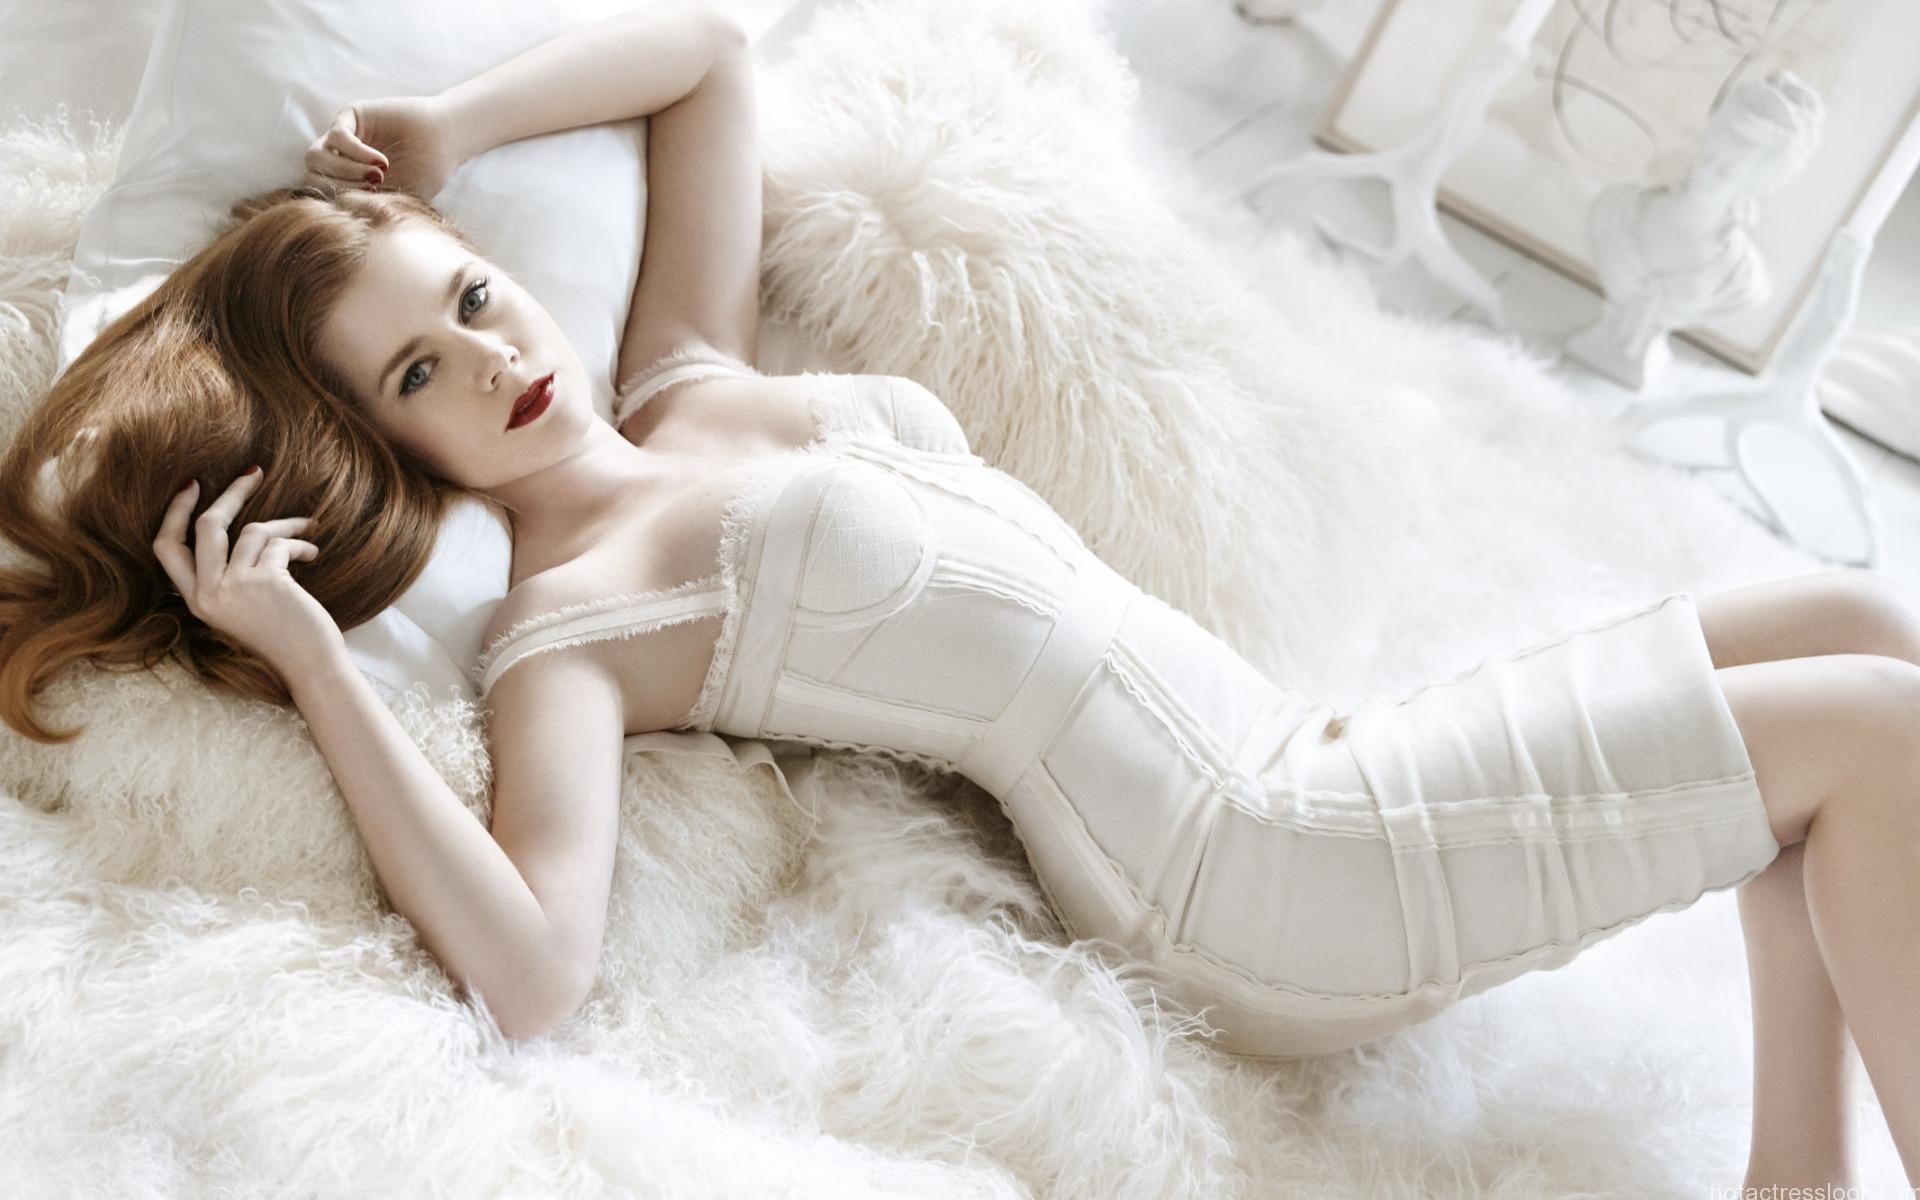 Amy adams sexy stills